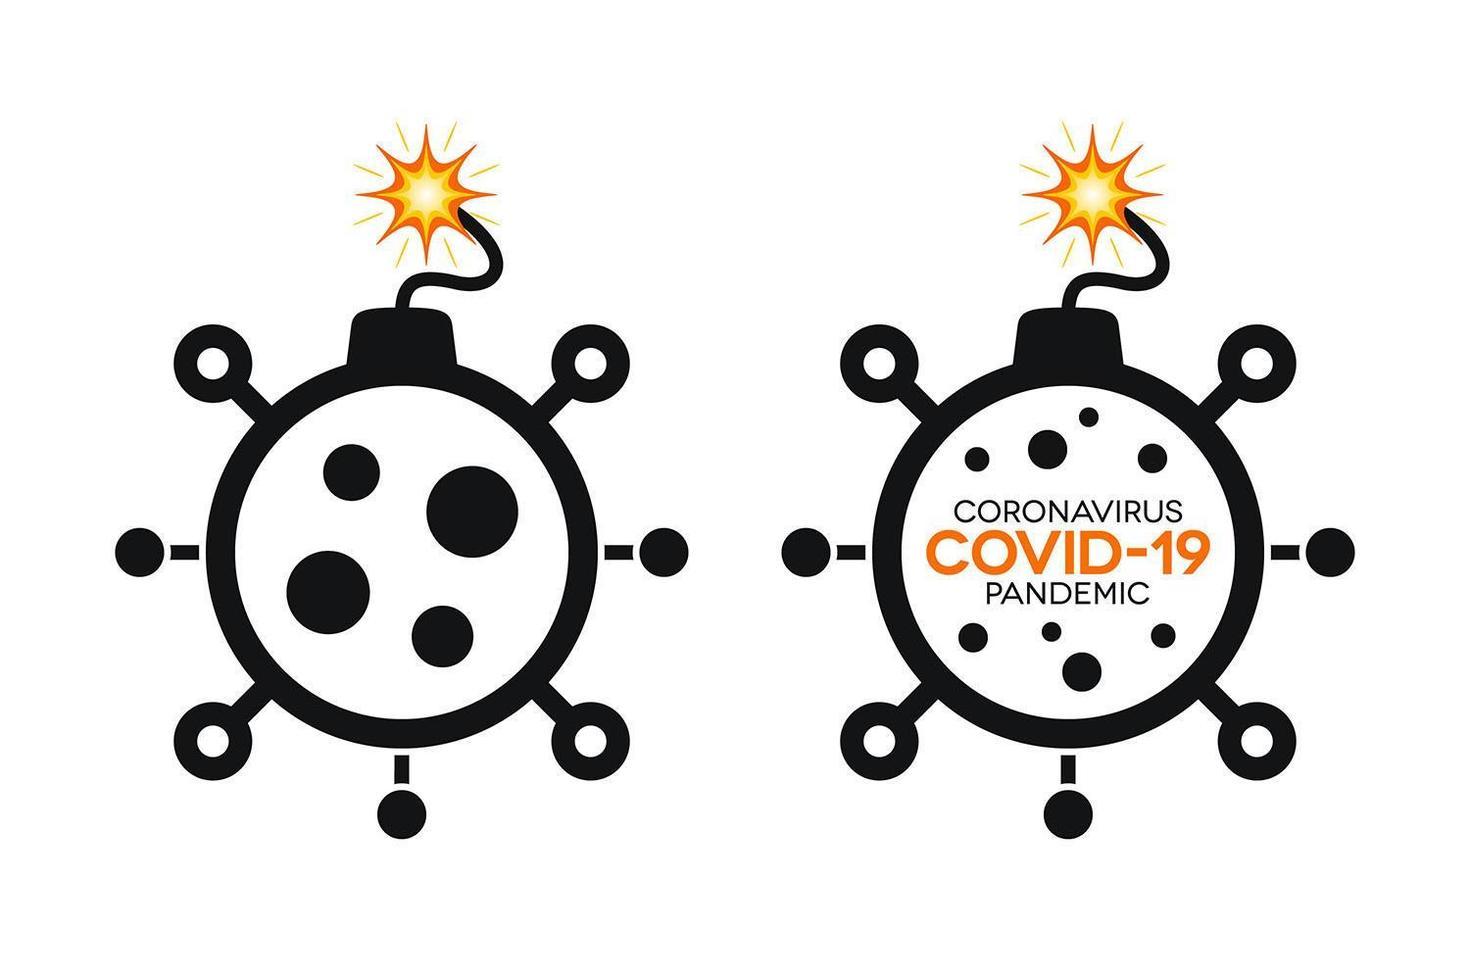 Simple Coronavirus Bomb Icons with Covid-19 vector